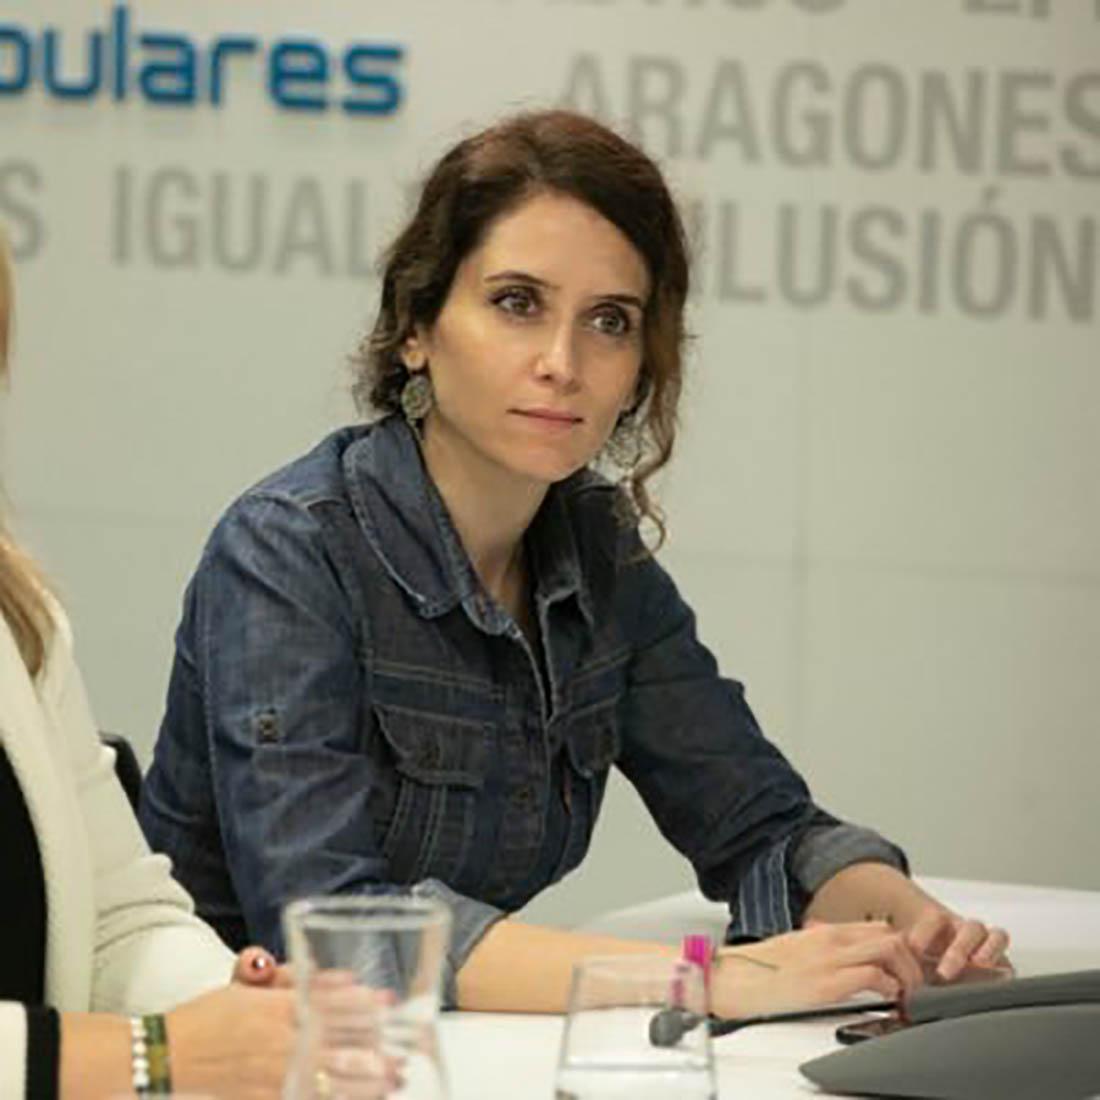 Isabel Díaz Ayuso/ Twitter @IdiazAyuso